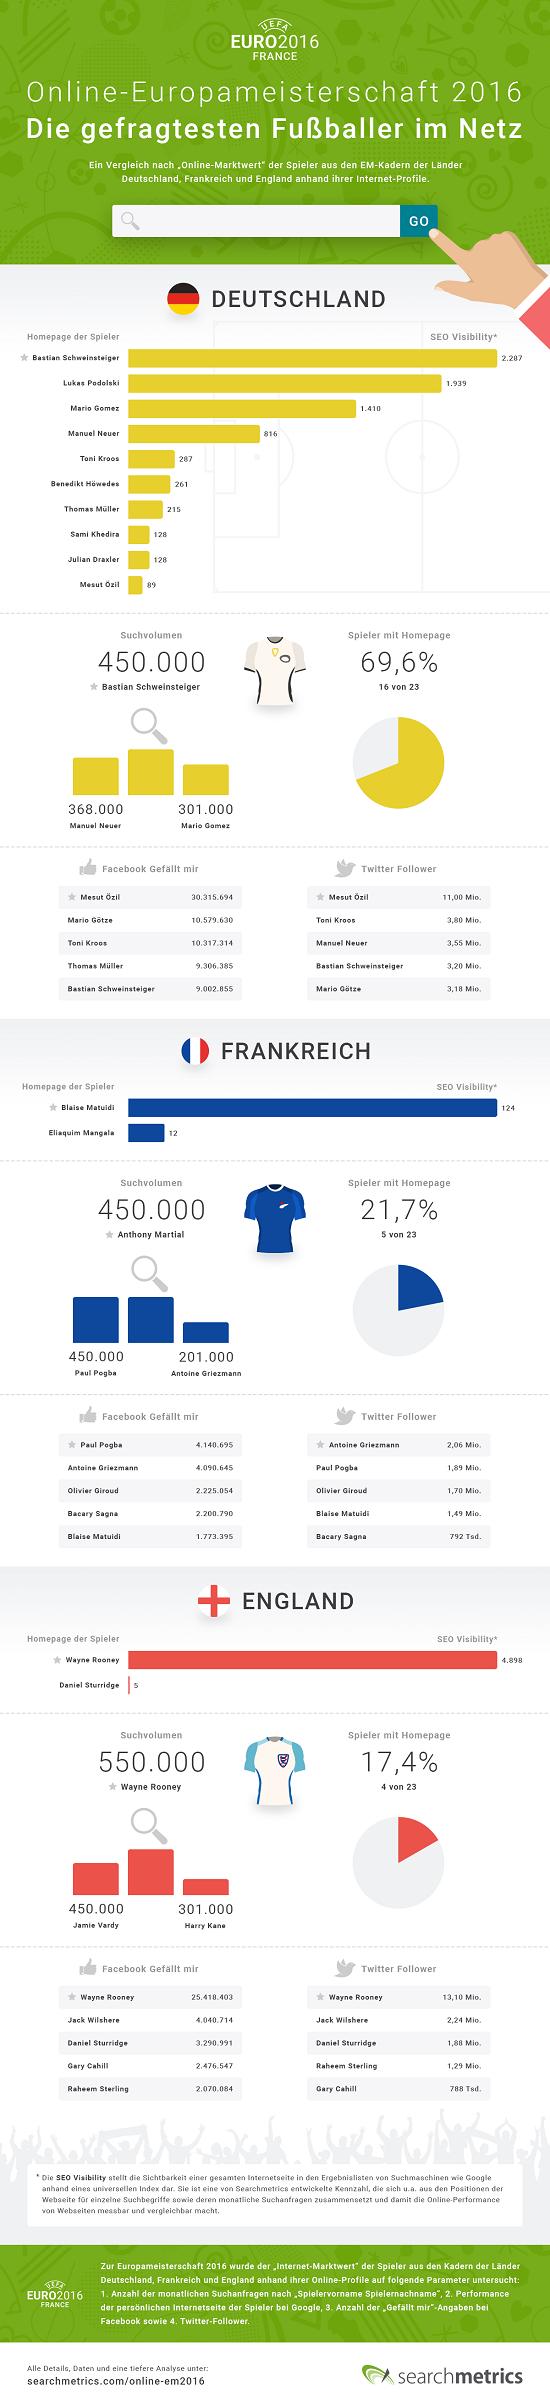 Searchmetrics Online-EM2016 Infografik - small